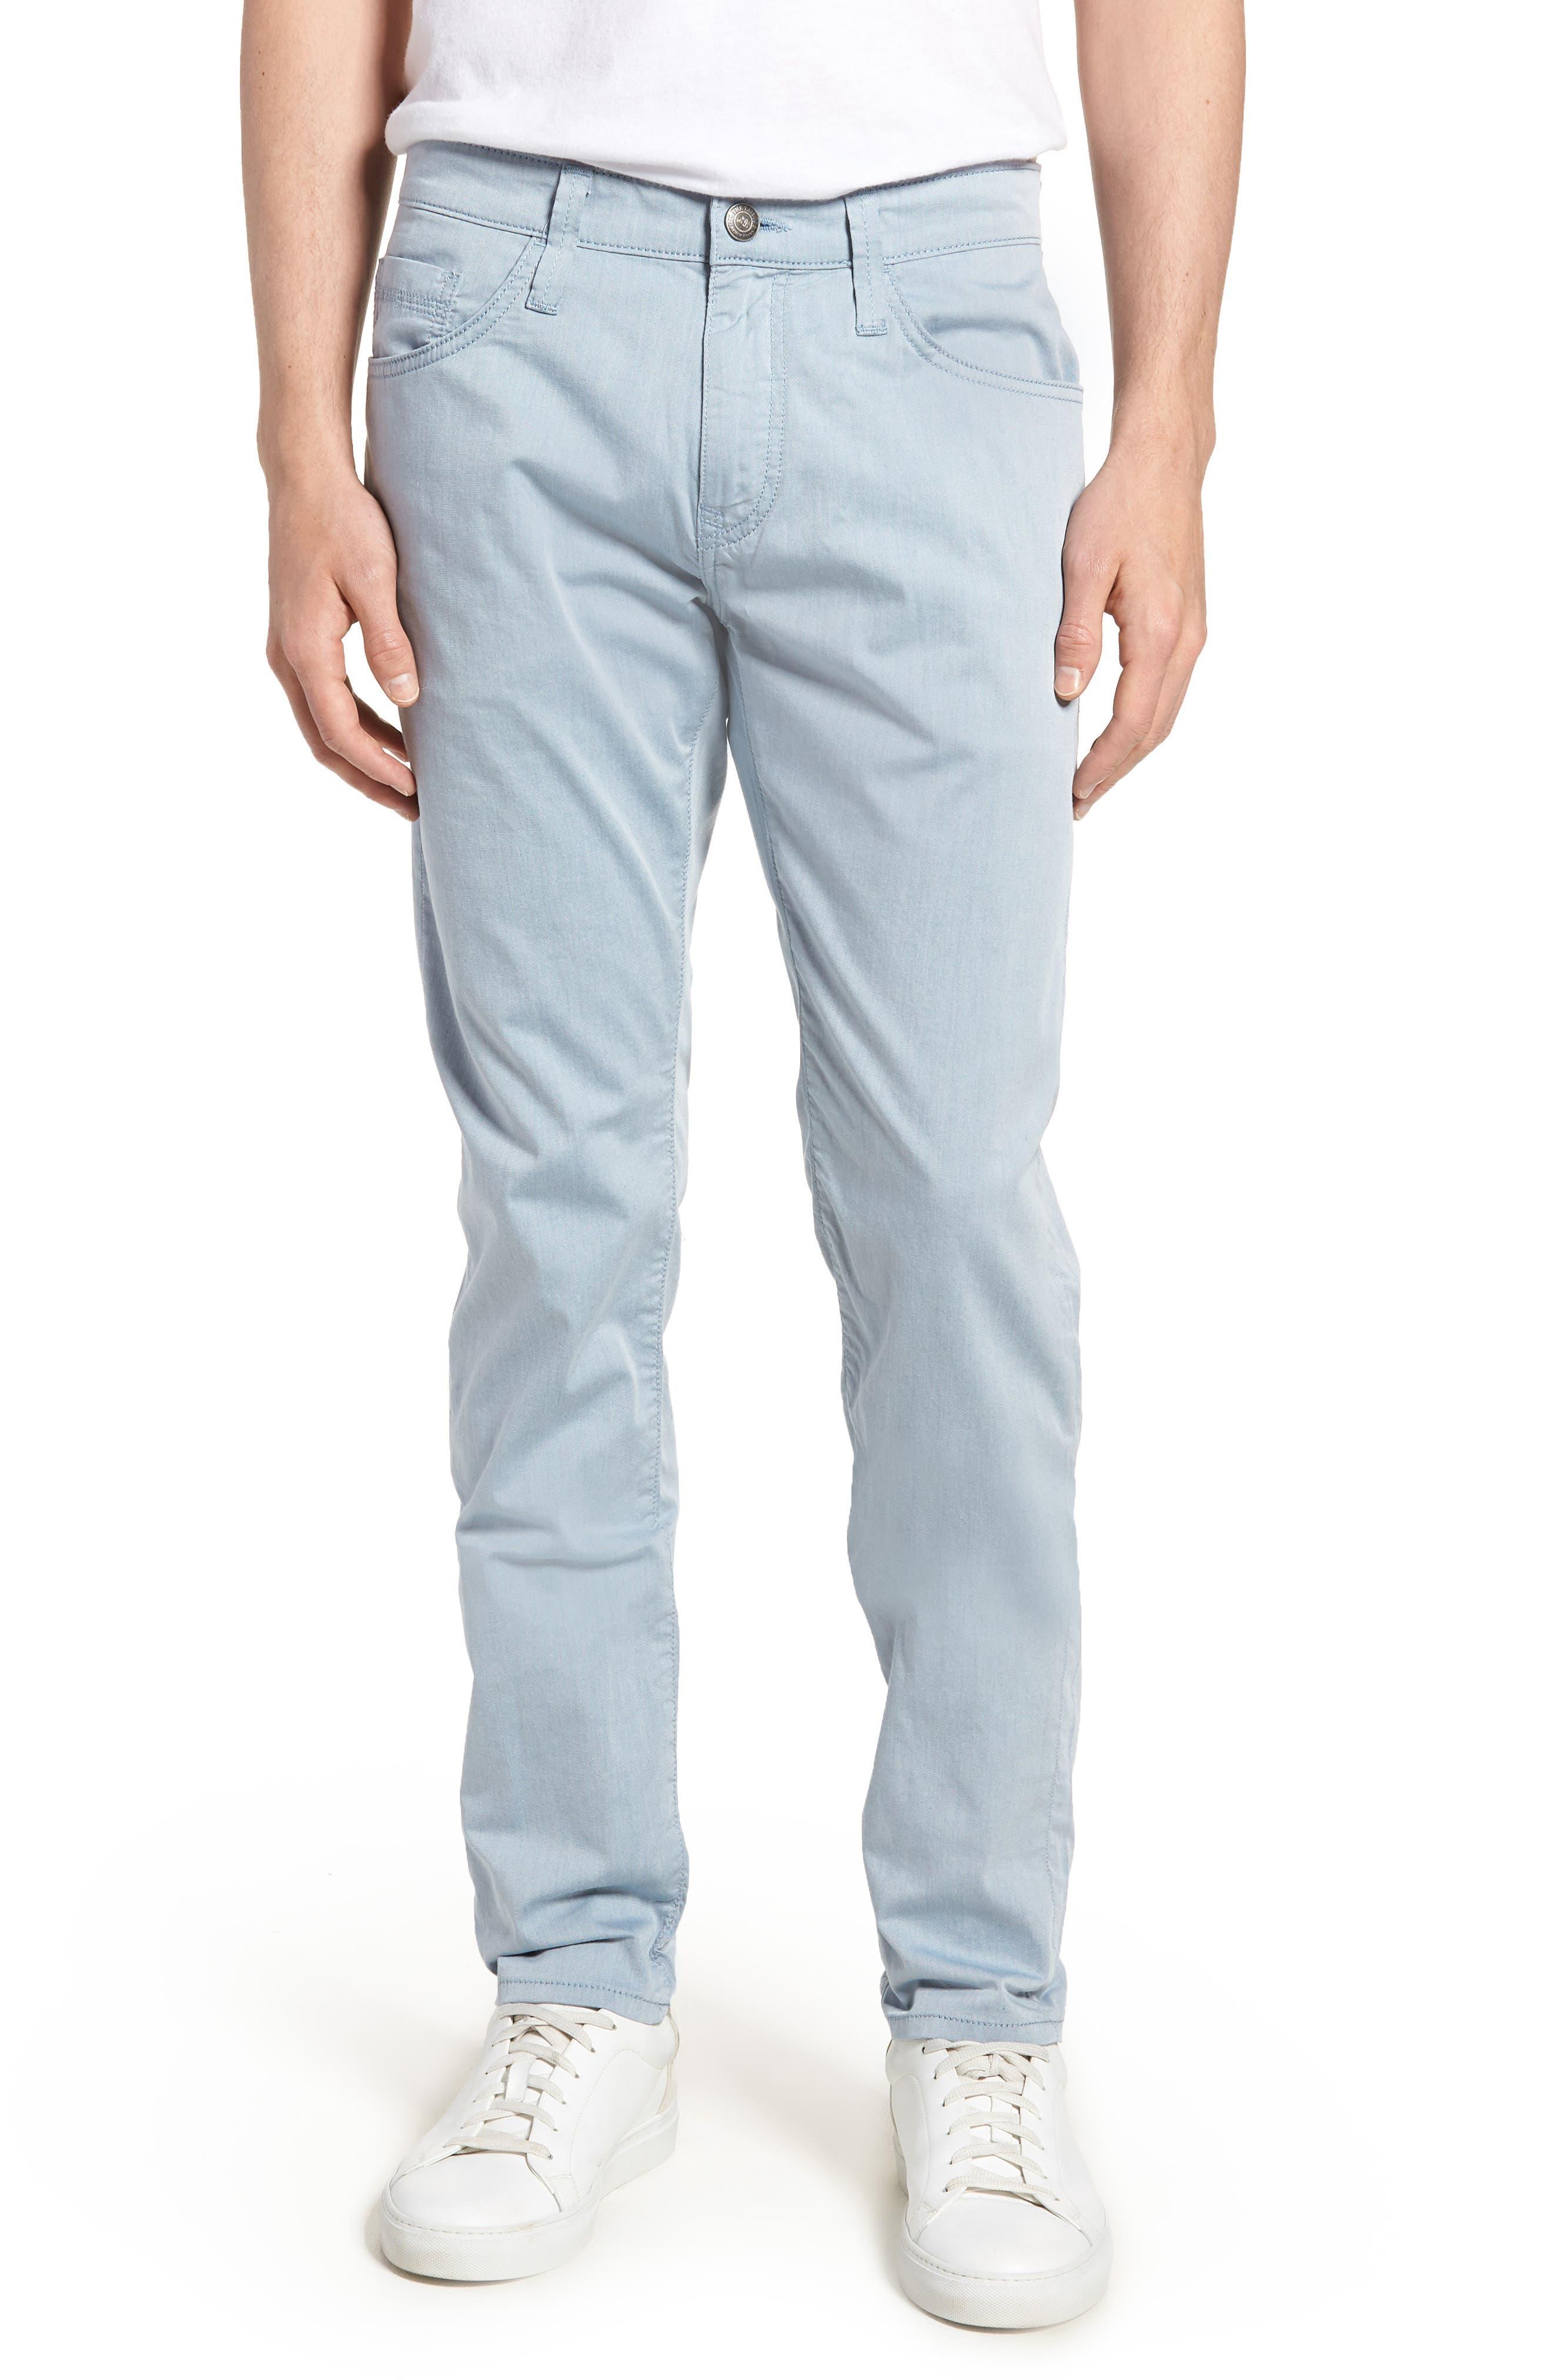 Jake Slim Fit Jeans,                         Main,                         color, Blue Reversed